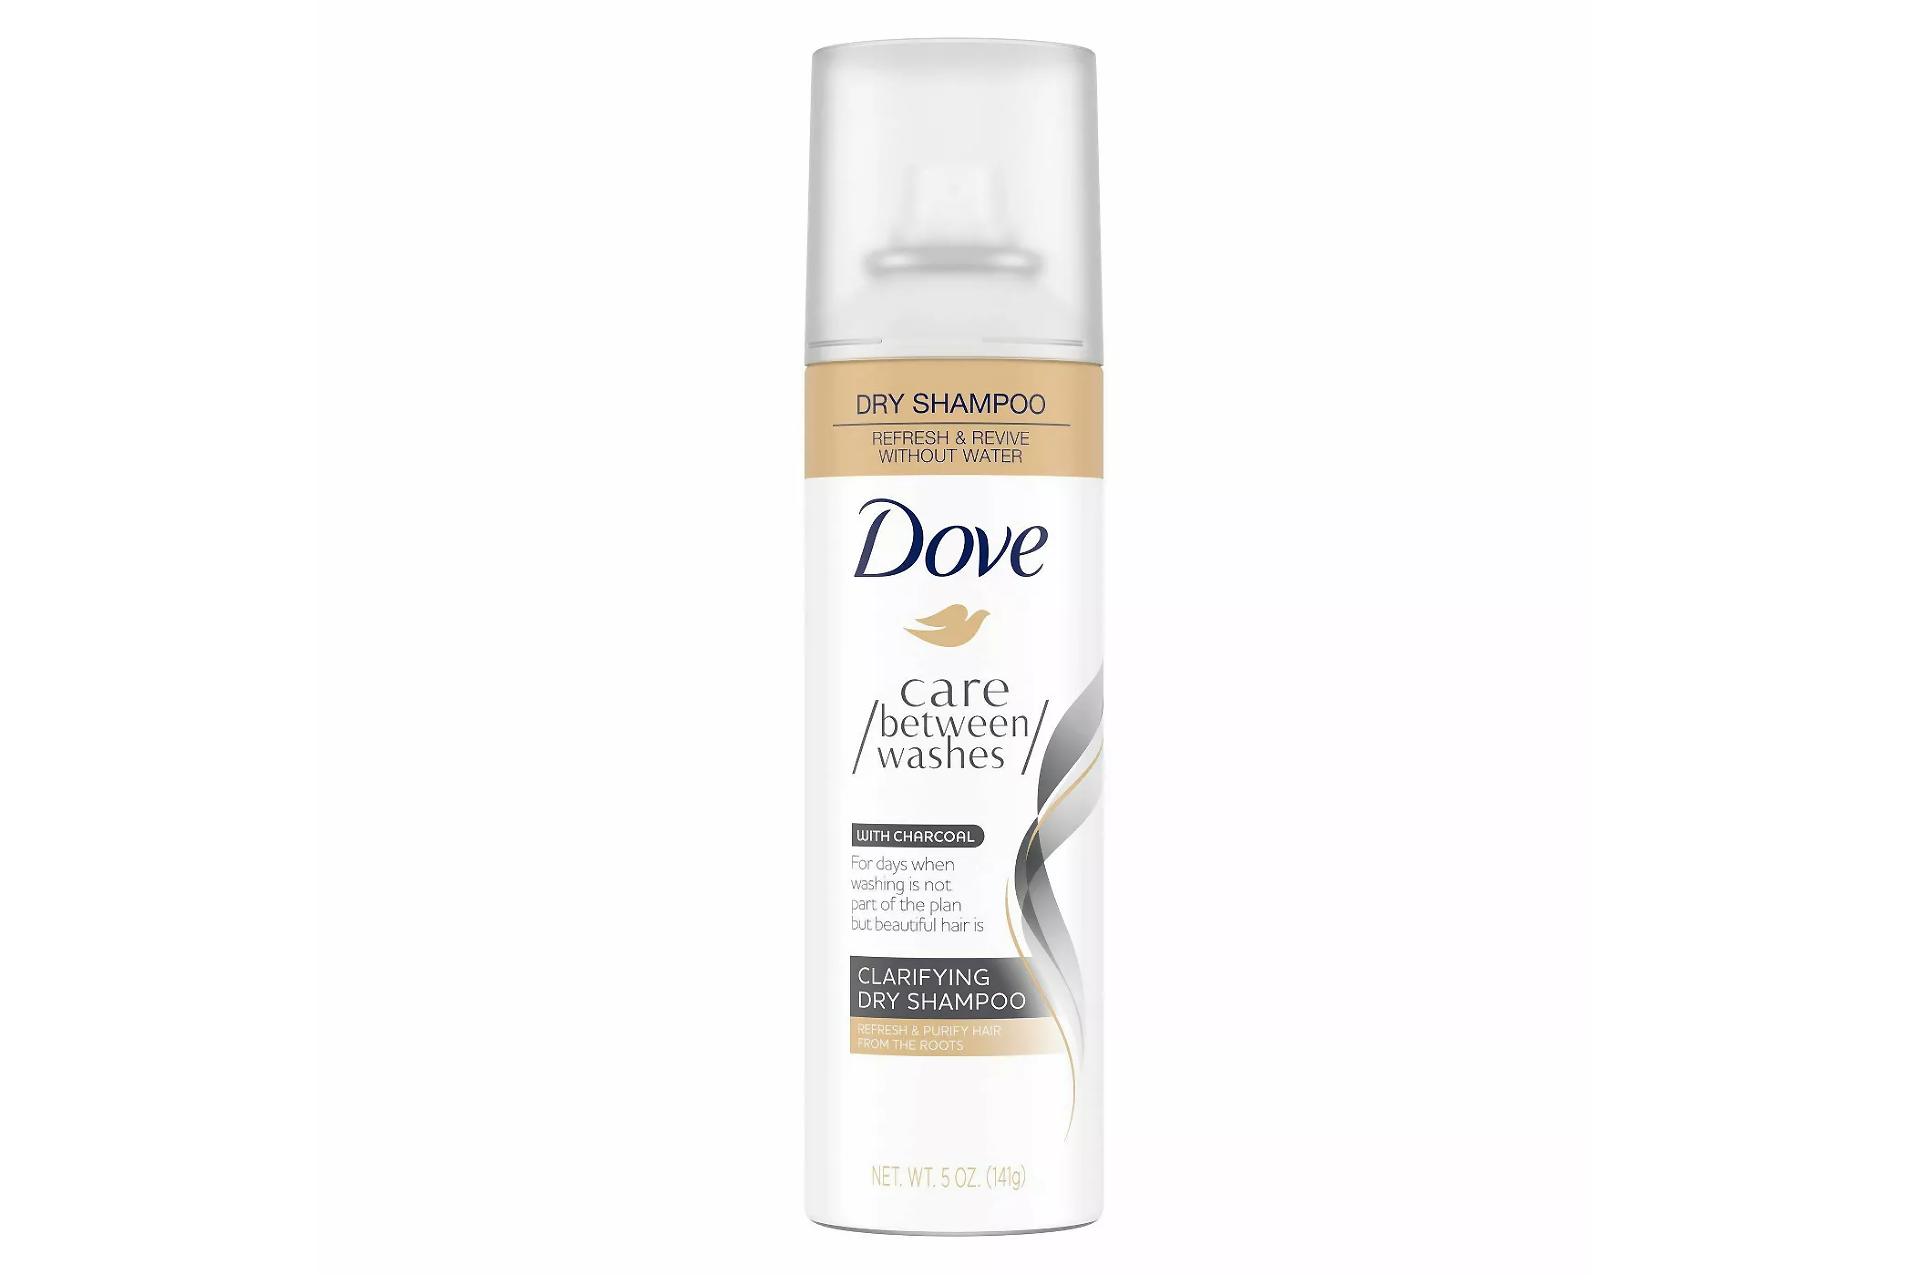 dove-florence-pugh